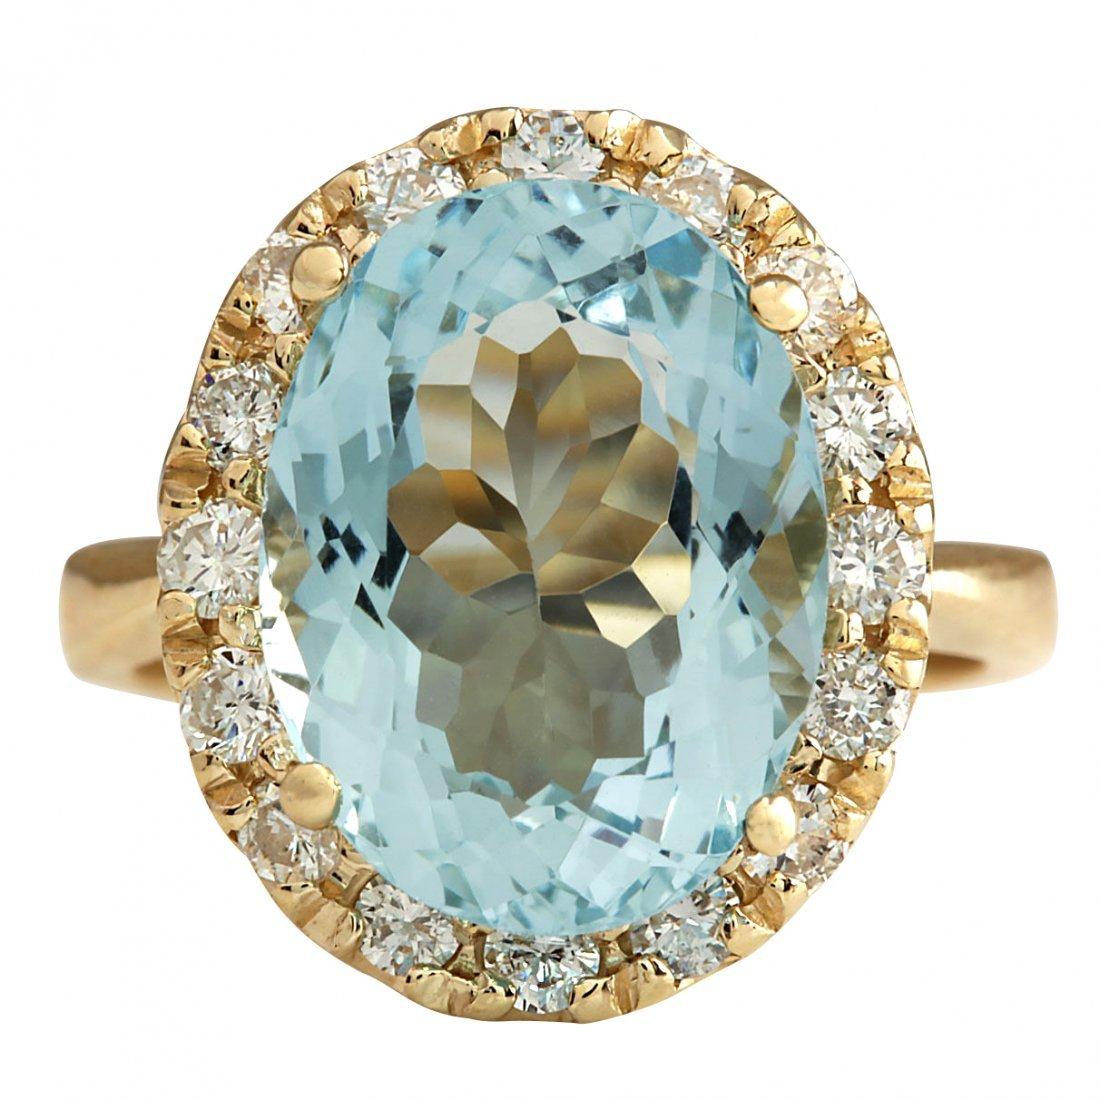 5.32CTW Natural Aquamarine And Diamond Ring 14K Solid